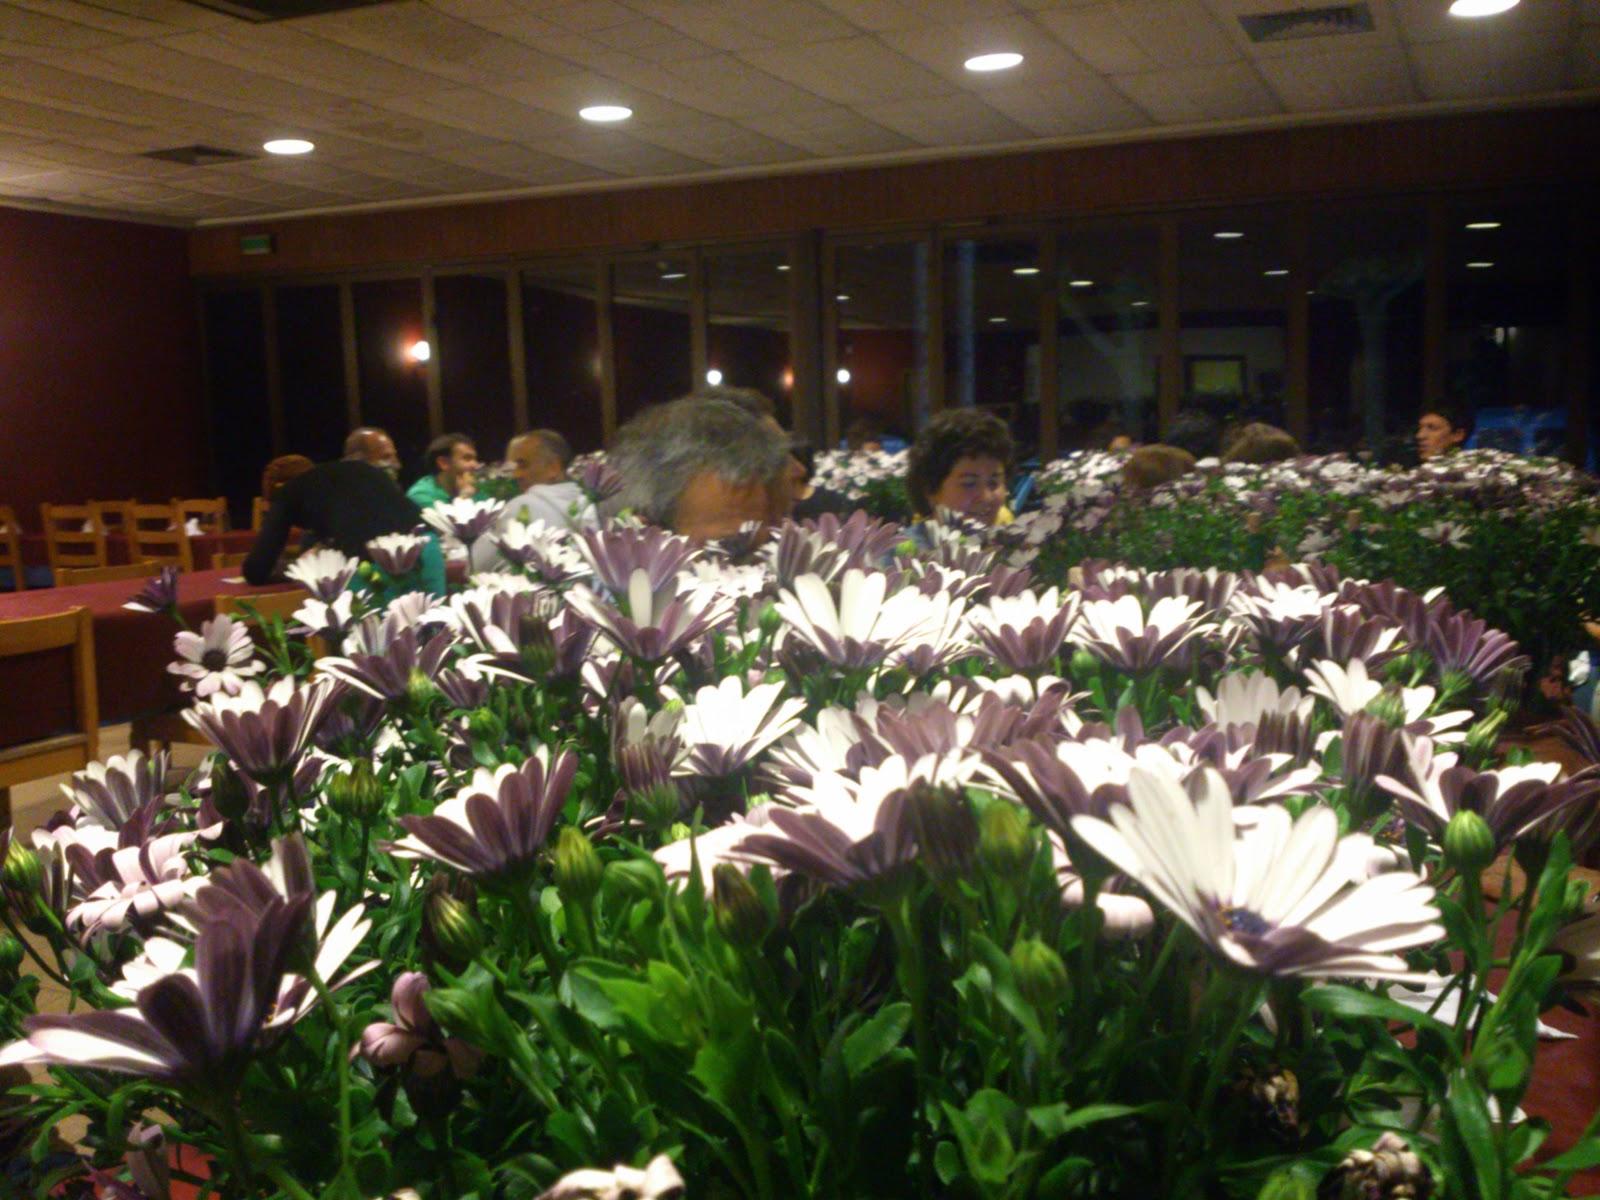 Blog del jard n bot nico de iturraran mayo 2014 for Restaurante jardin botanico